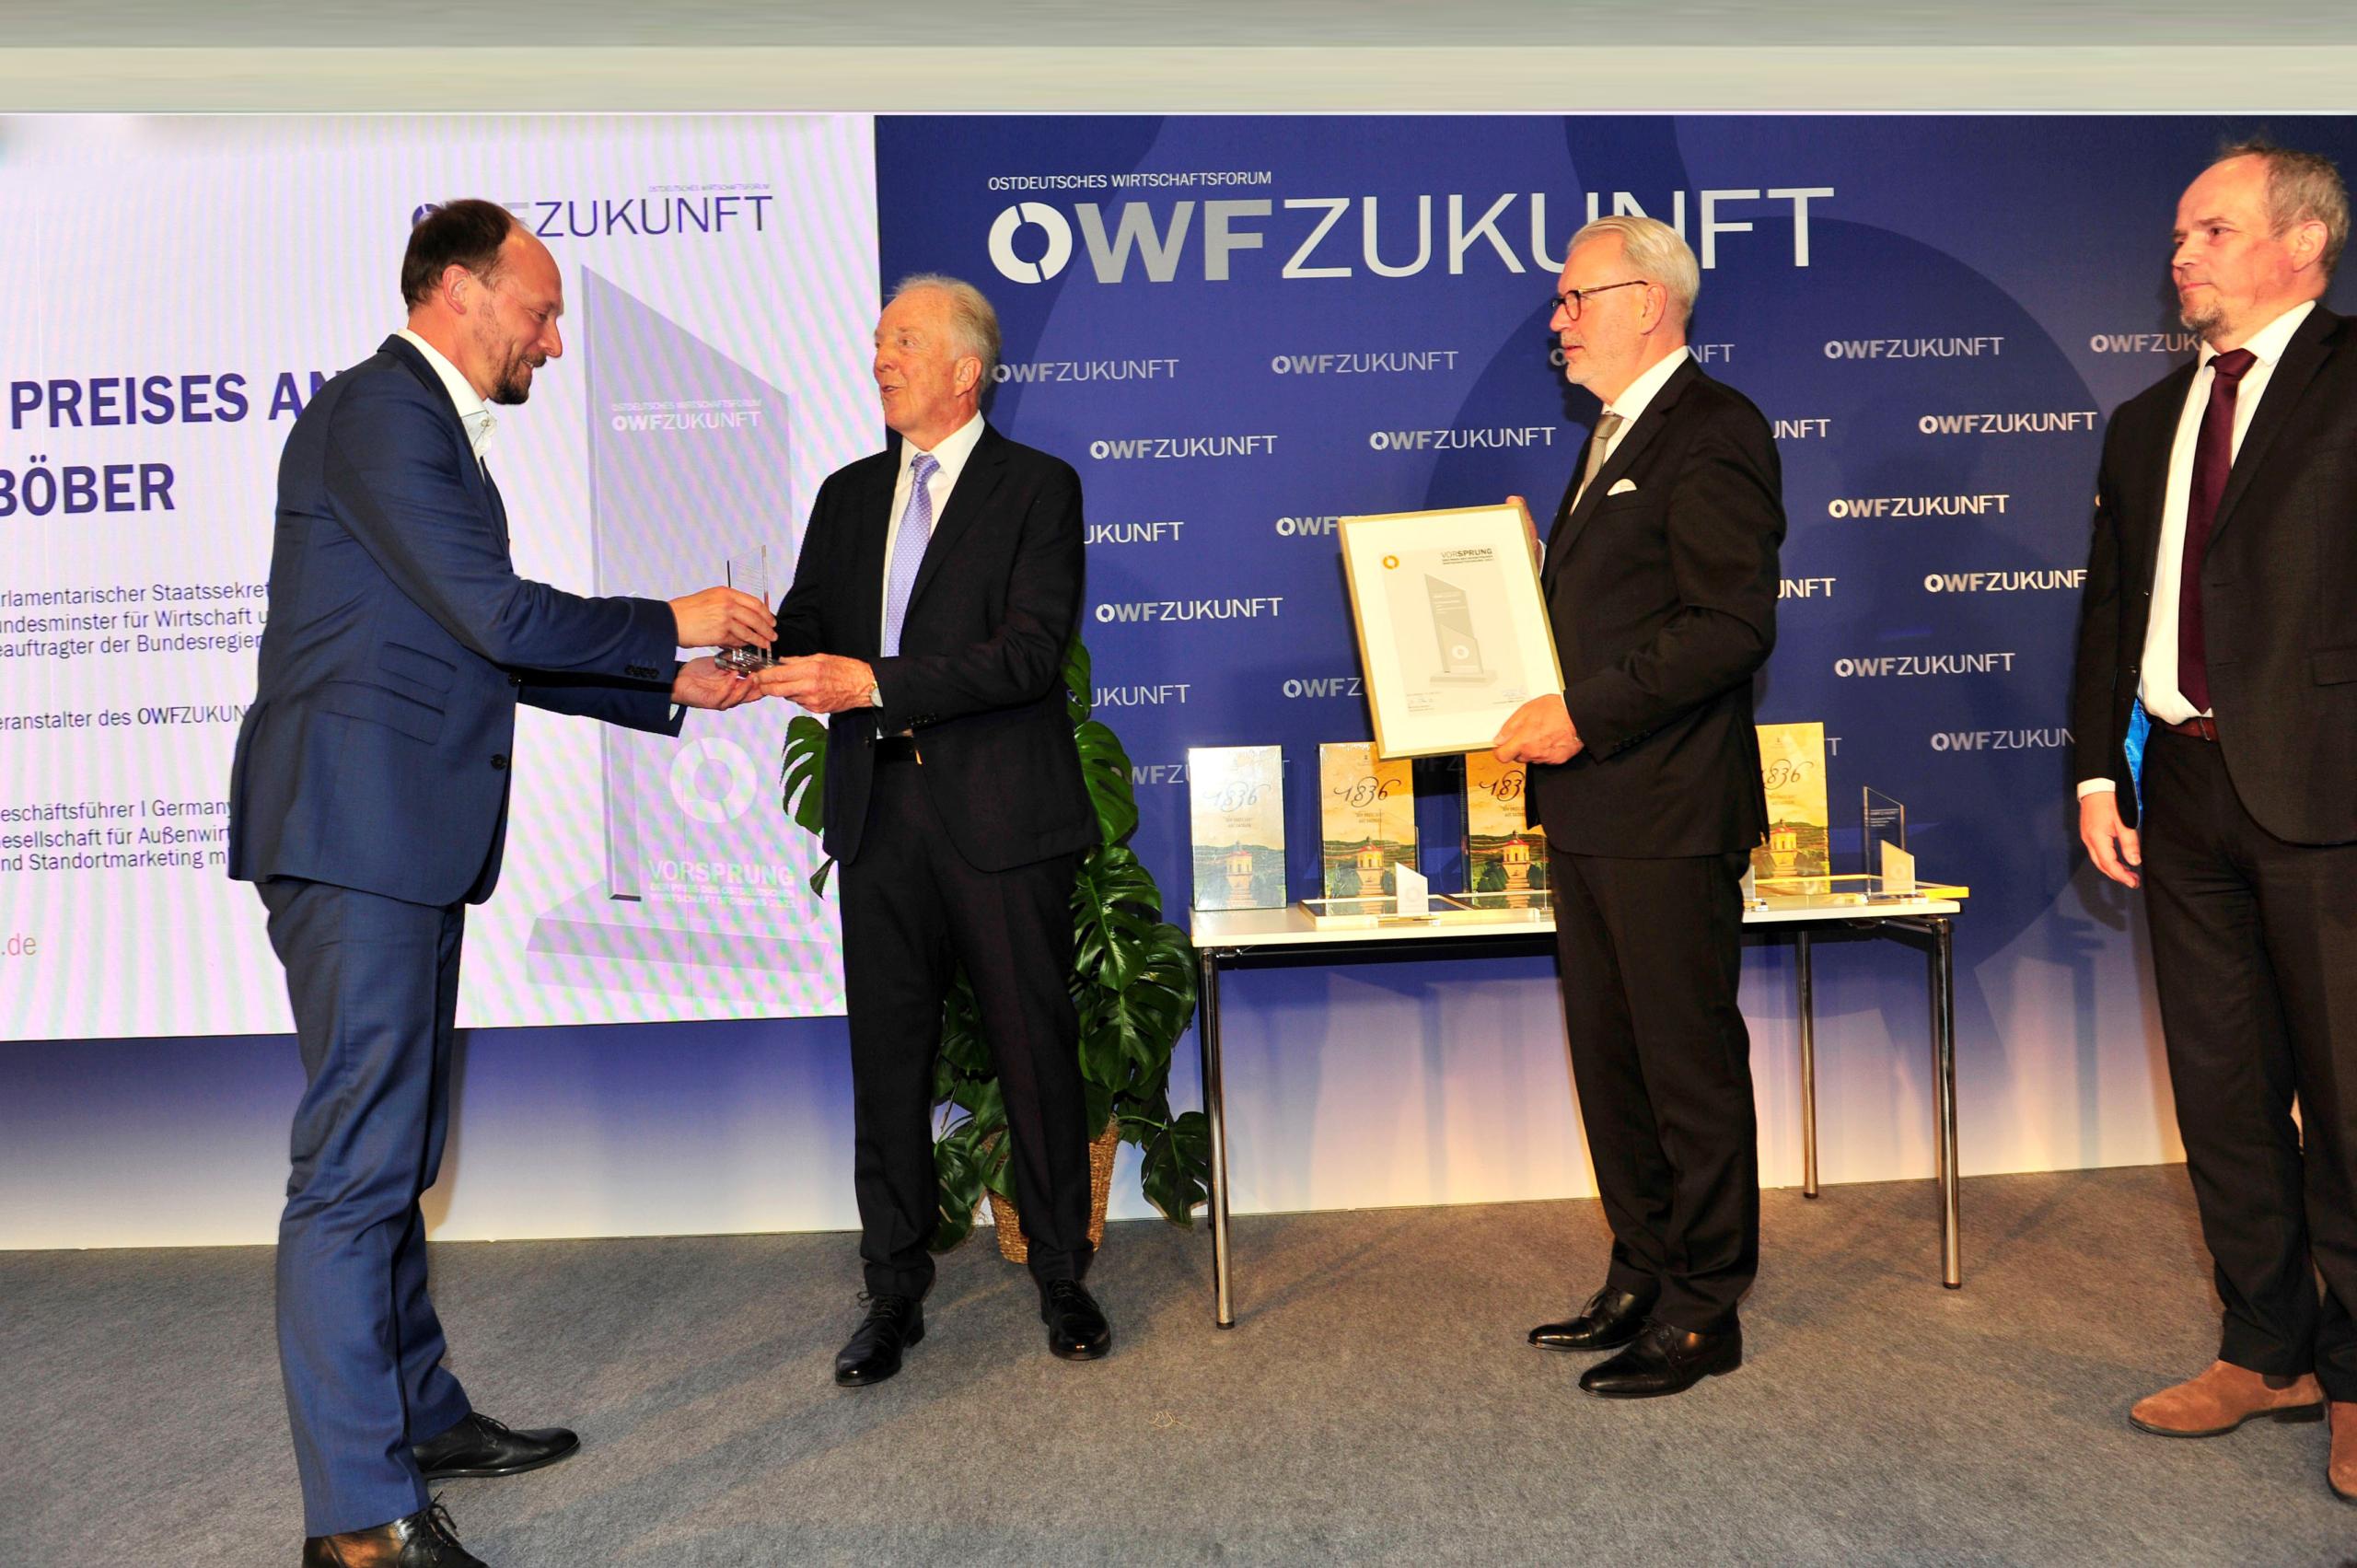 Glatt Ingenieurtechnik honored as an outstanding company with the East German Business Forum Award_2021-06-14